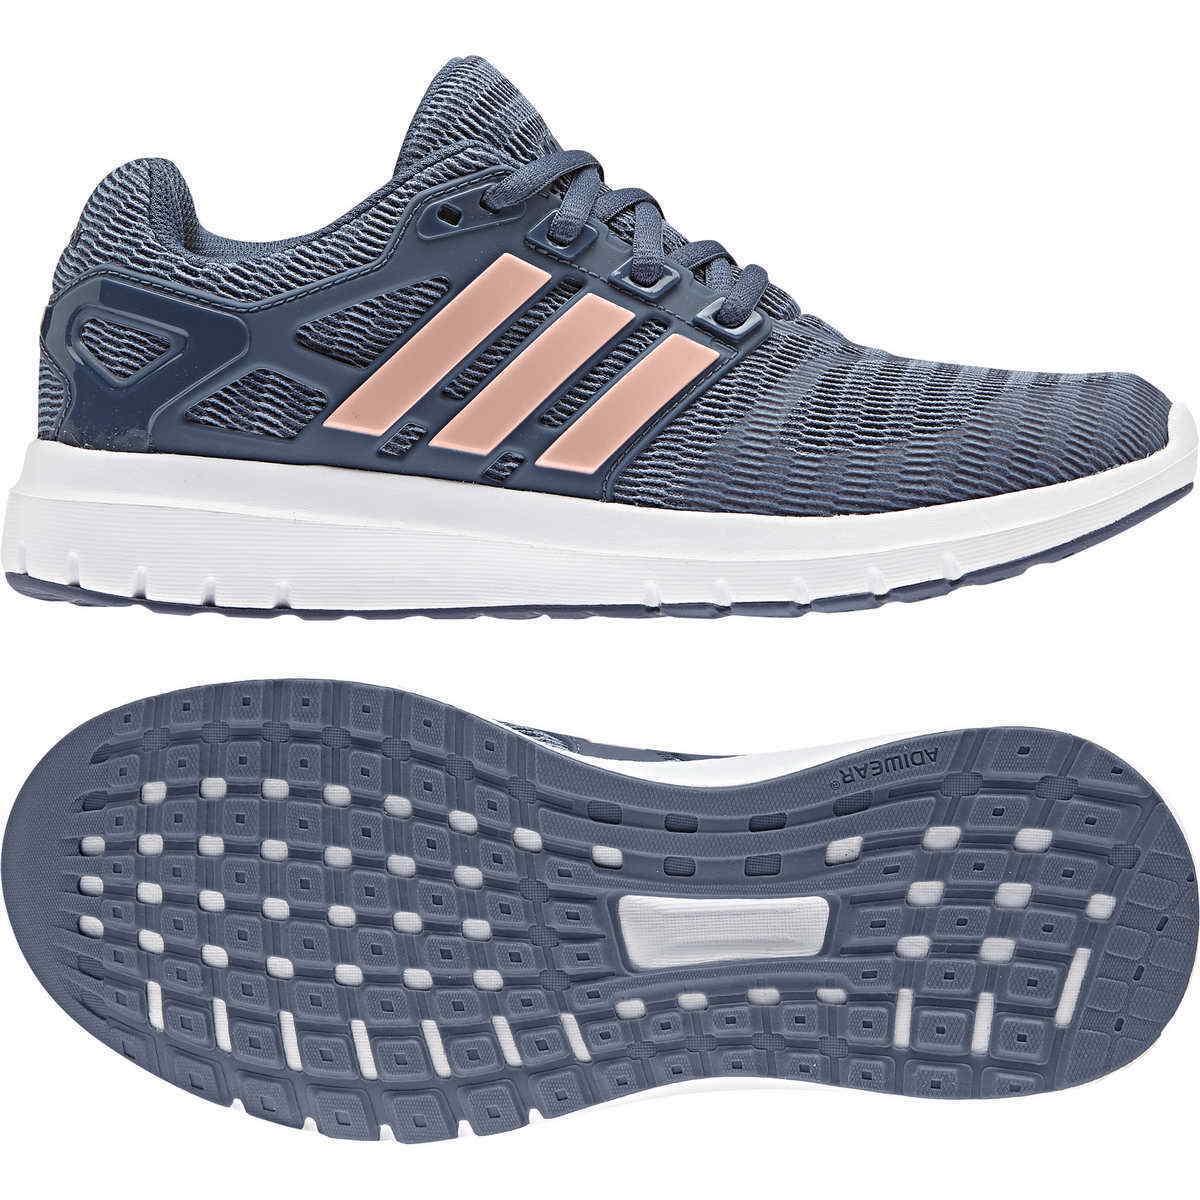 scarpe da ginnastica ADIDAS ENERGY Cloud RAW grigio BLU rosa MESH lacci b44852 cloudfoam | Commercio All'ingrosso  | Maschio/Ragazze Scarpa